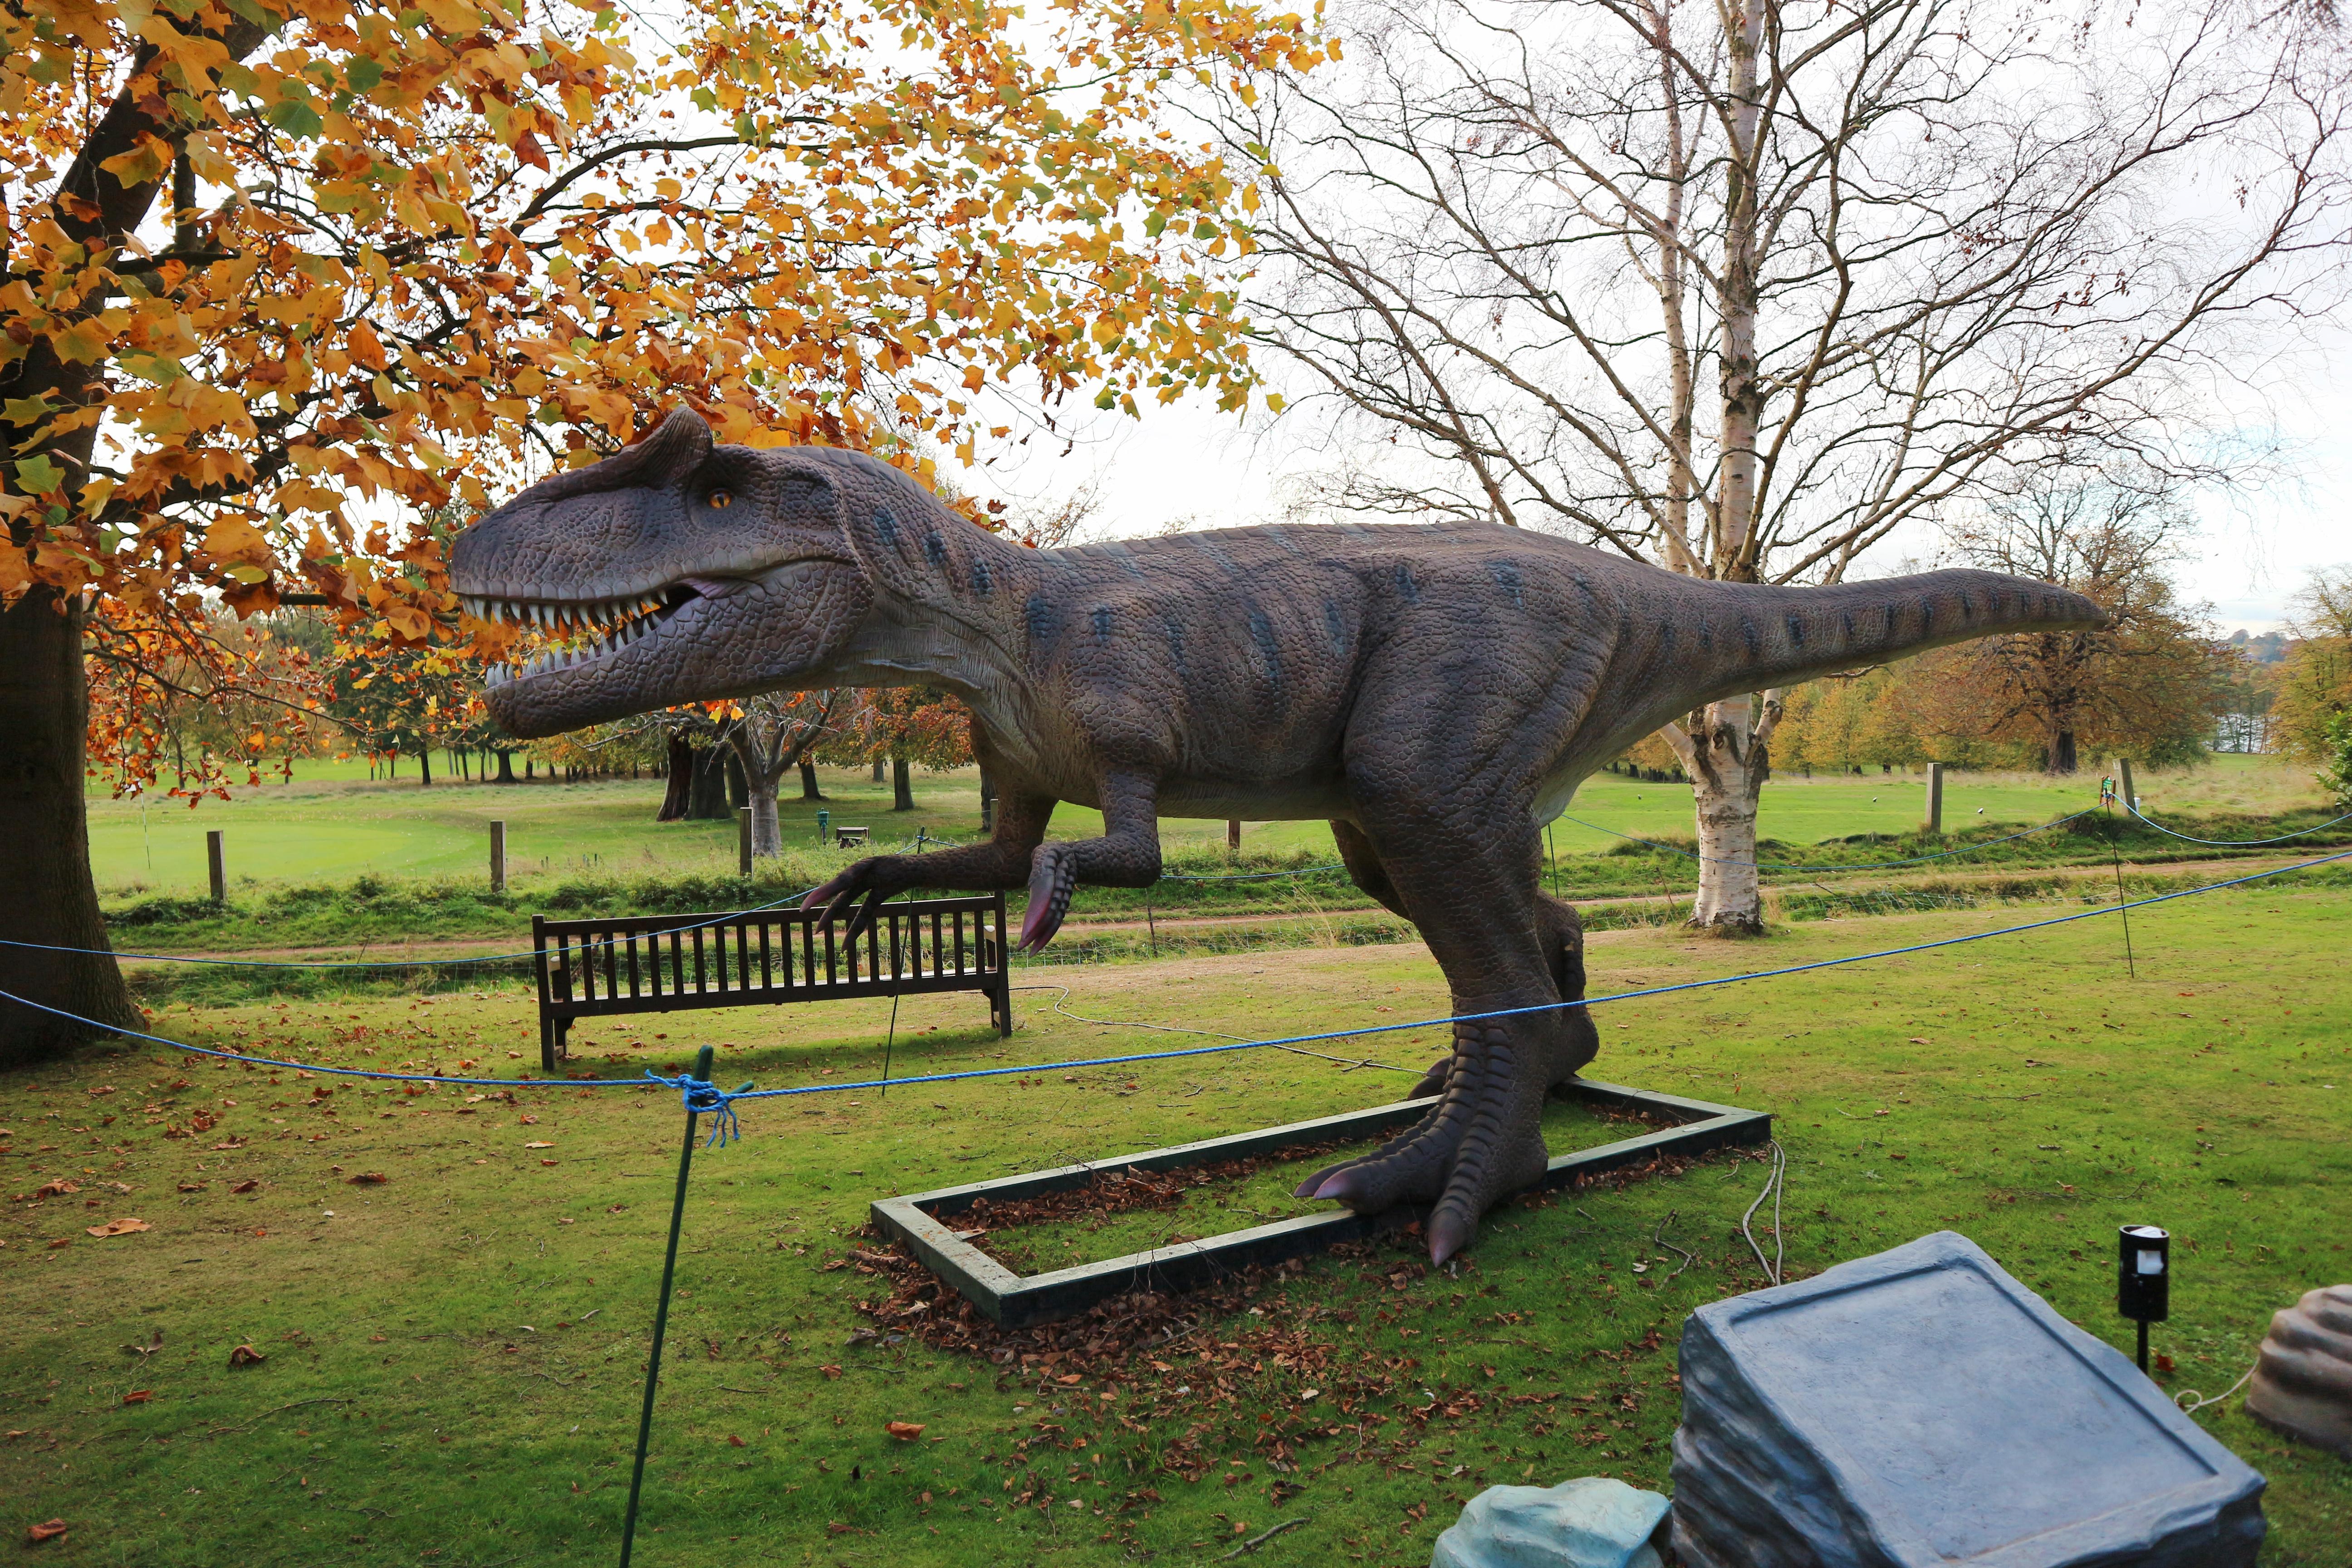 Jurassic Kingdom at Wollaton Park